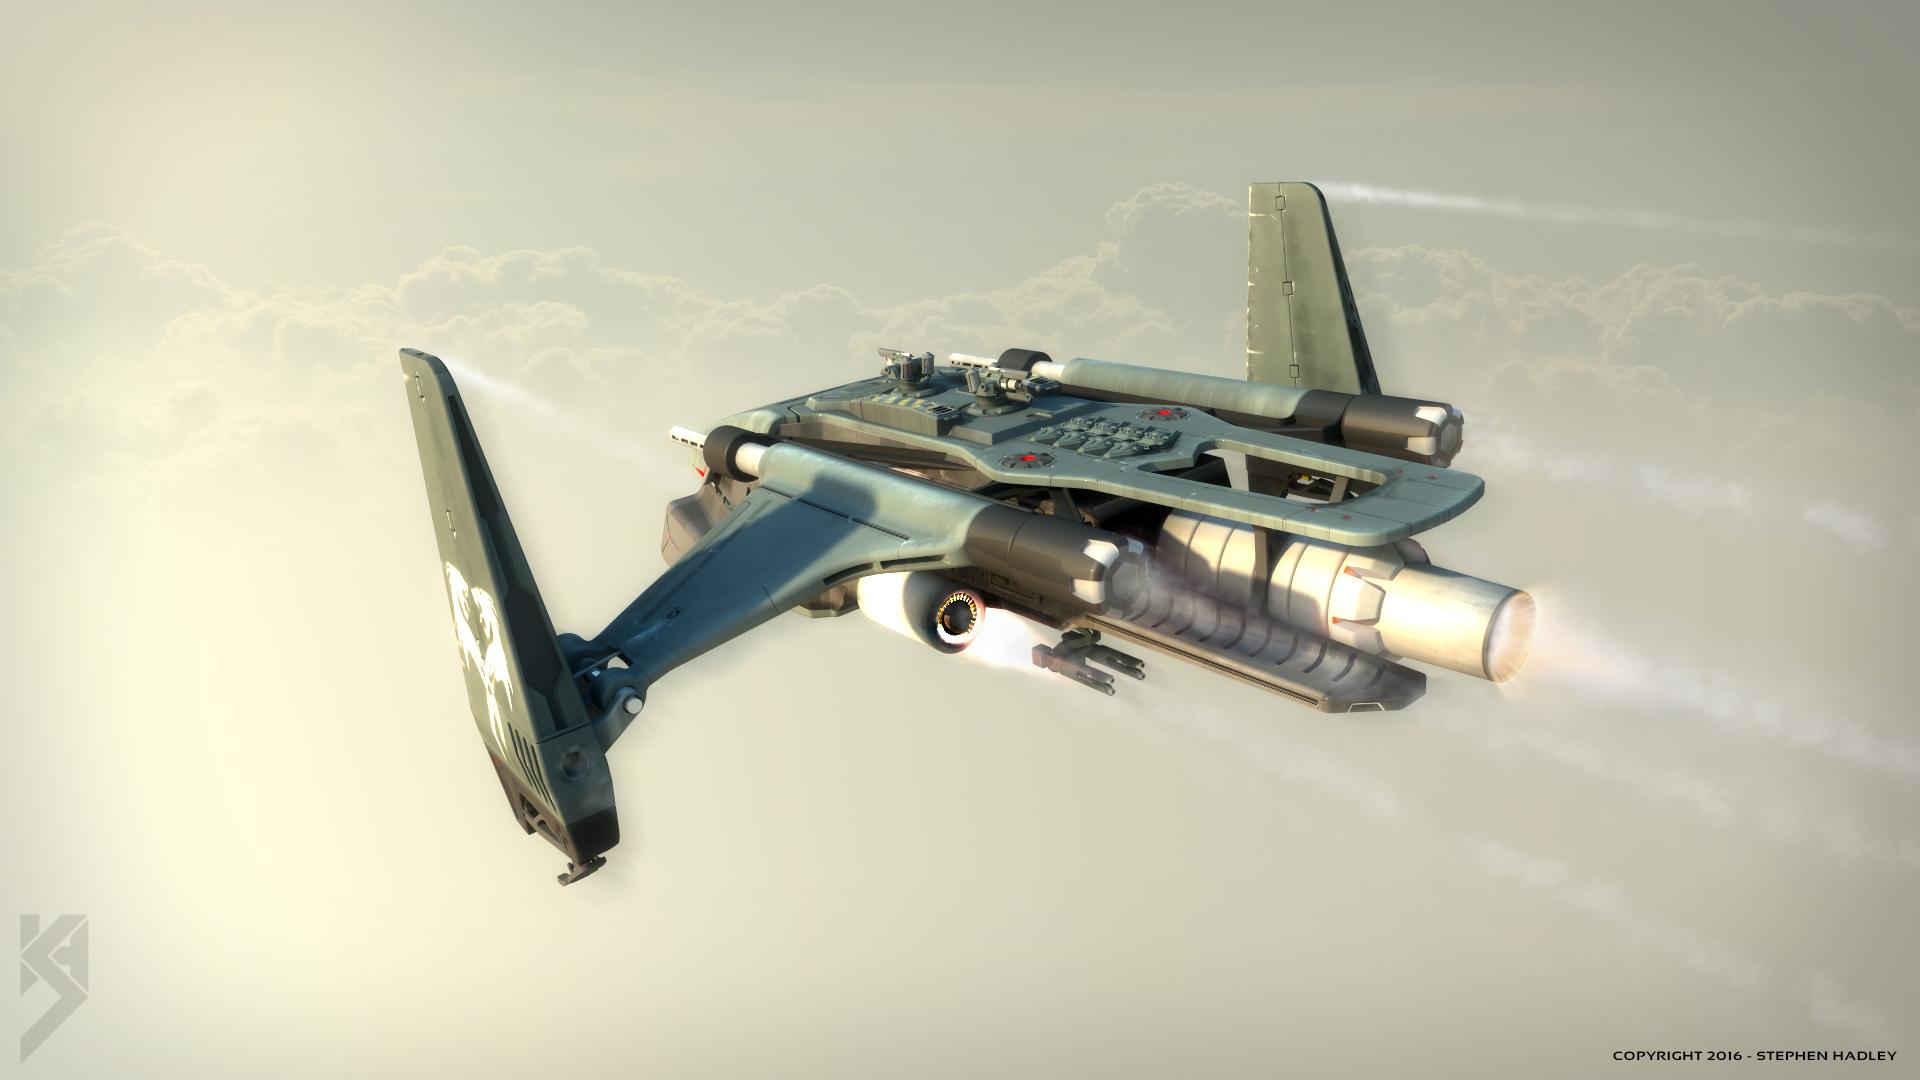 Impala gunship 3 by Sphinx1